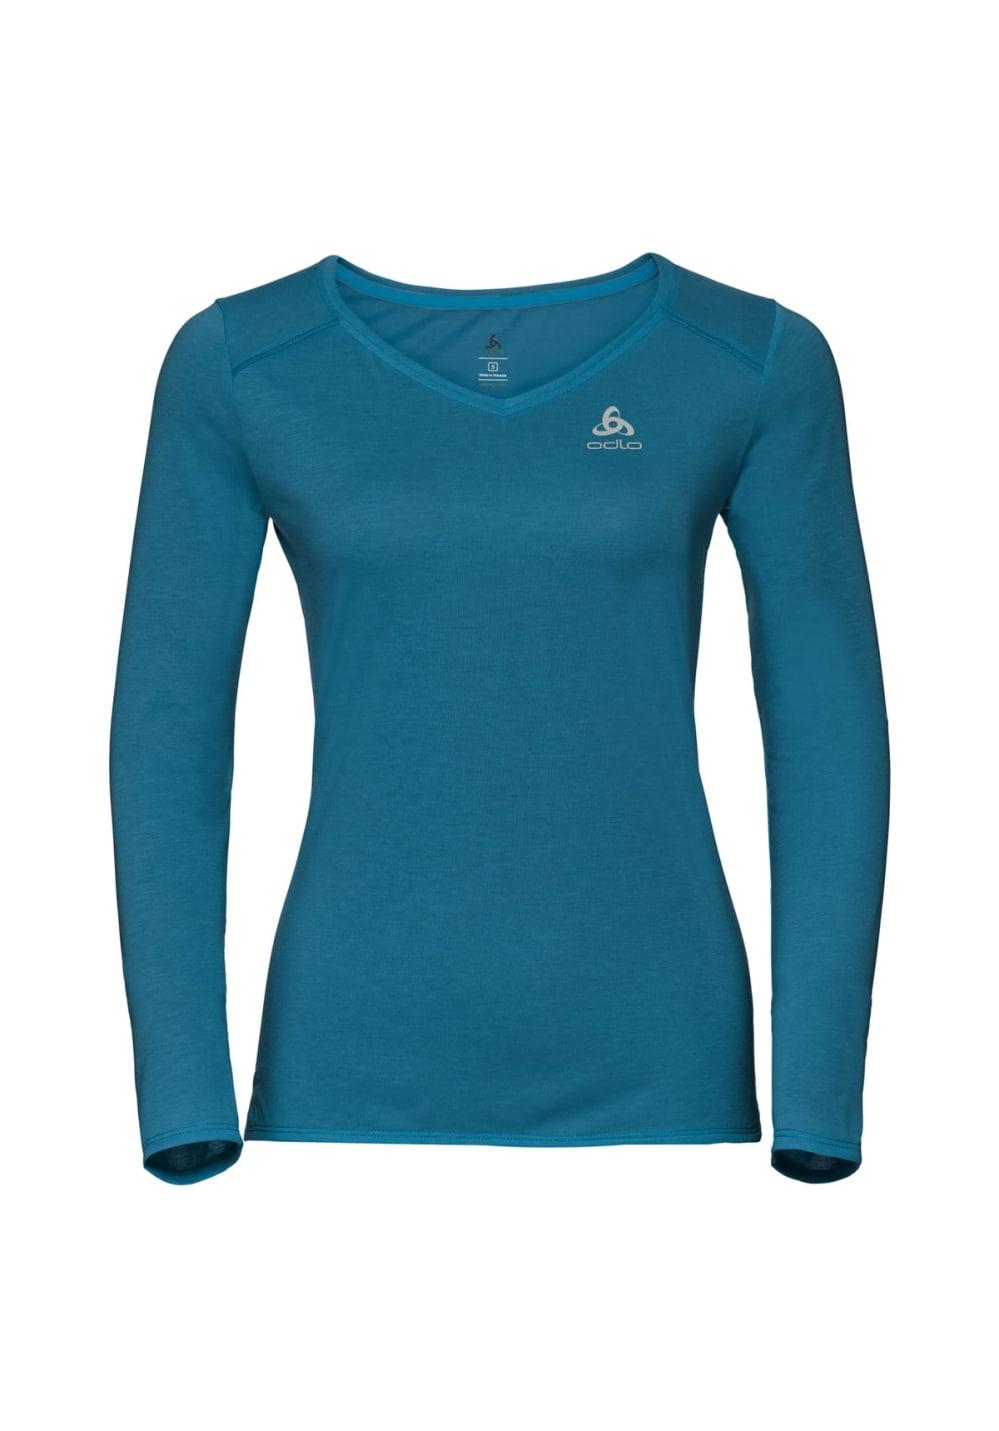 Sportmode für Frauen - Odlo Bl Top Crew Neck Long Sleeve Kumano Dry Laufshirts für Damen Blau  - Onlineshop 21Run